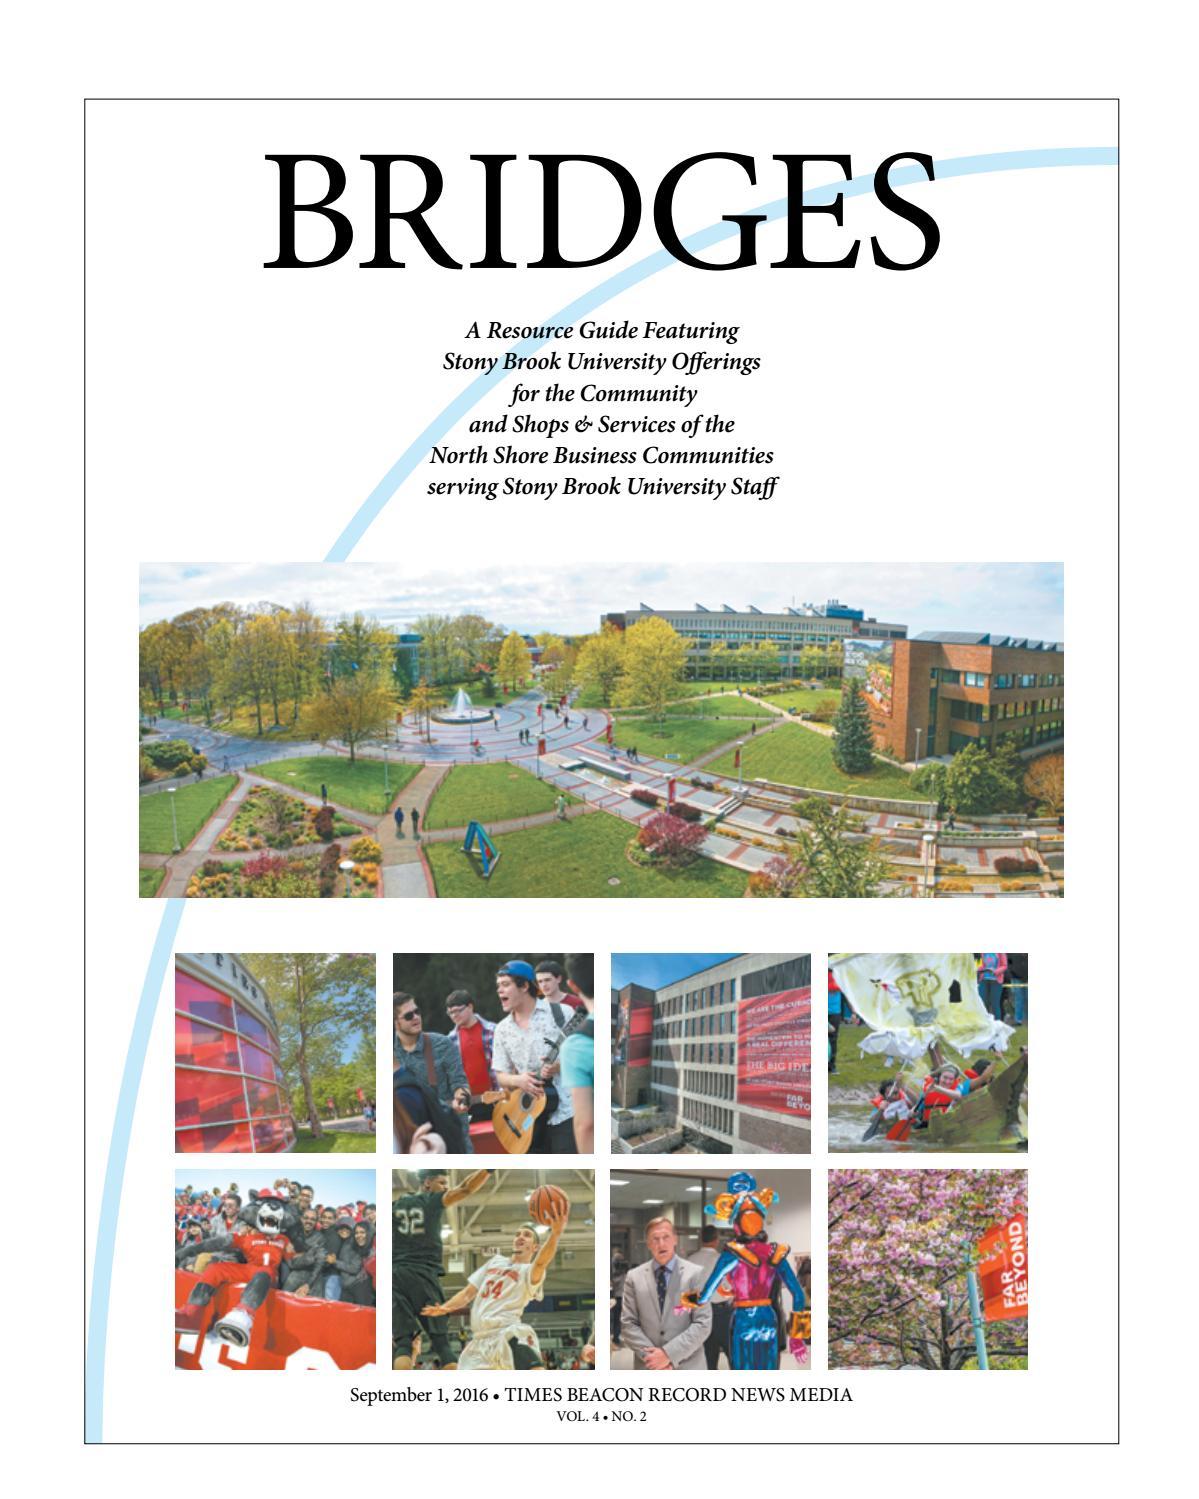 bridges september 1 2016 by tbr news media issuu